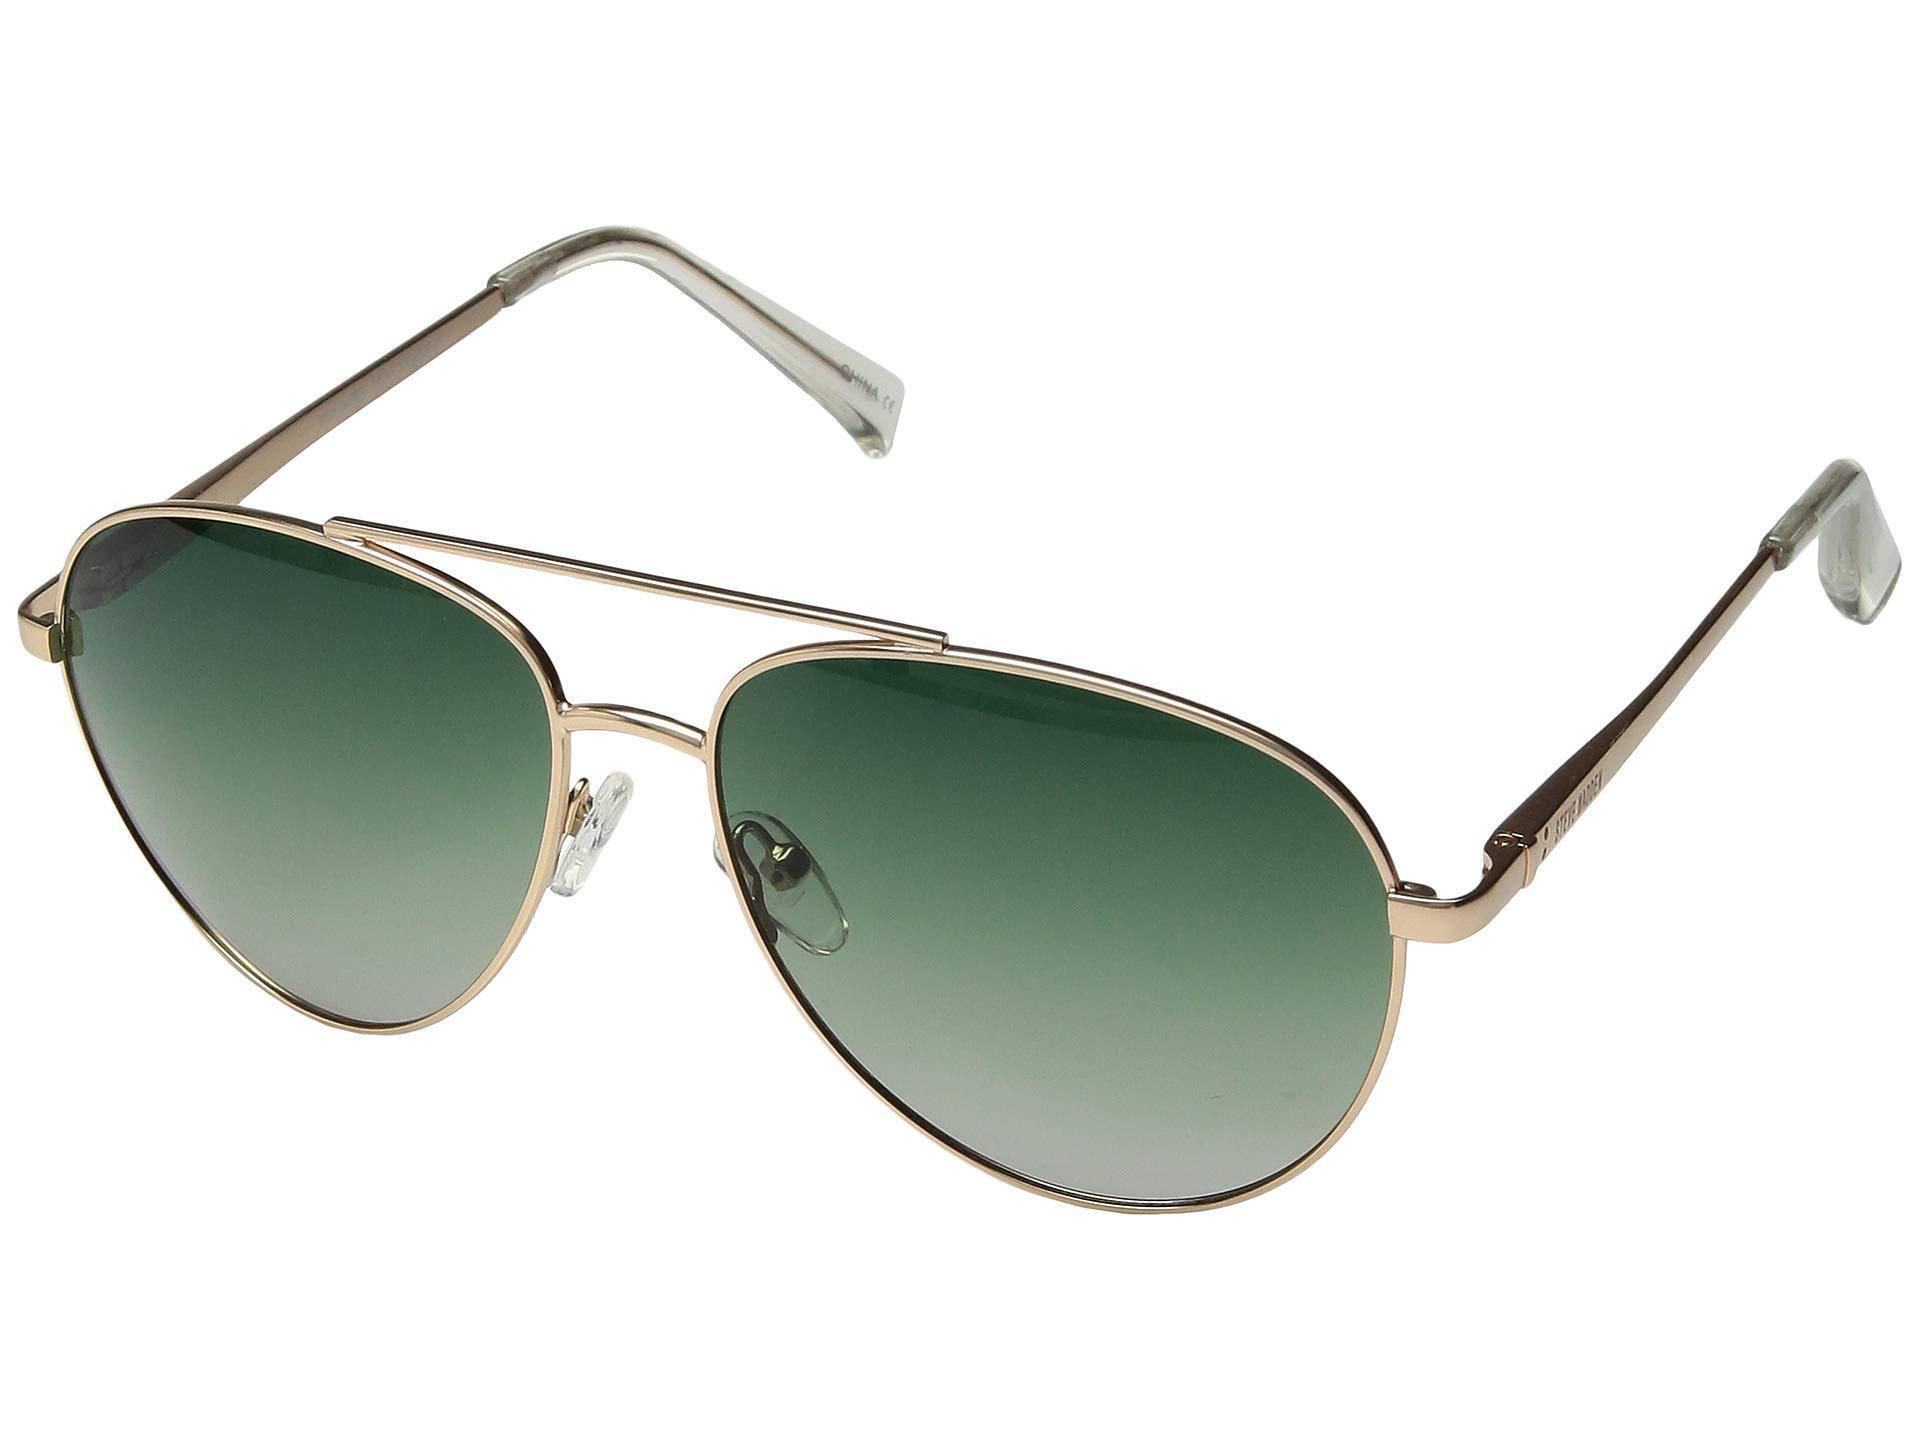 d6f1bf330fb Lyst - Steve Madden Polarized Max (gold Frame green Lens) Fashion ...